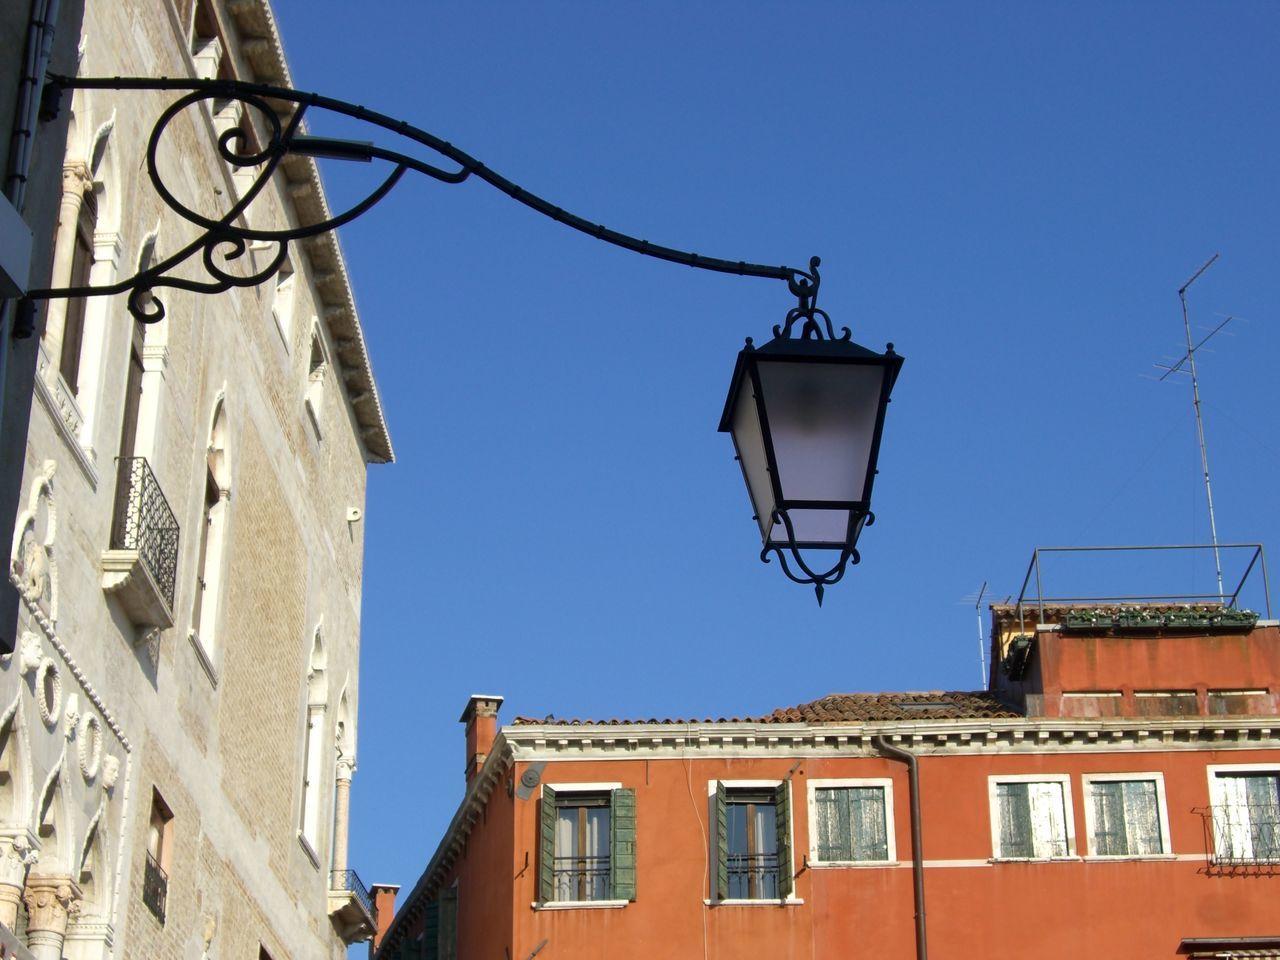 Architecture Building Building Exterior Exterior Façade Outdoors Street Light Urban Lamp-bracket